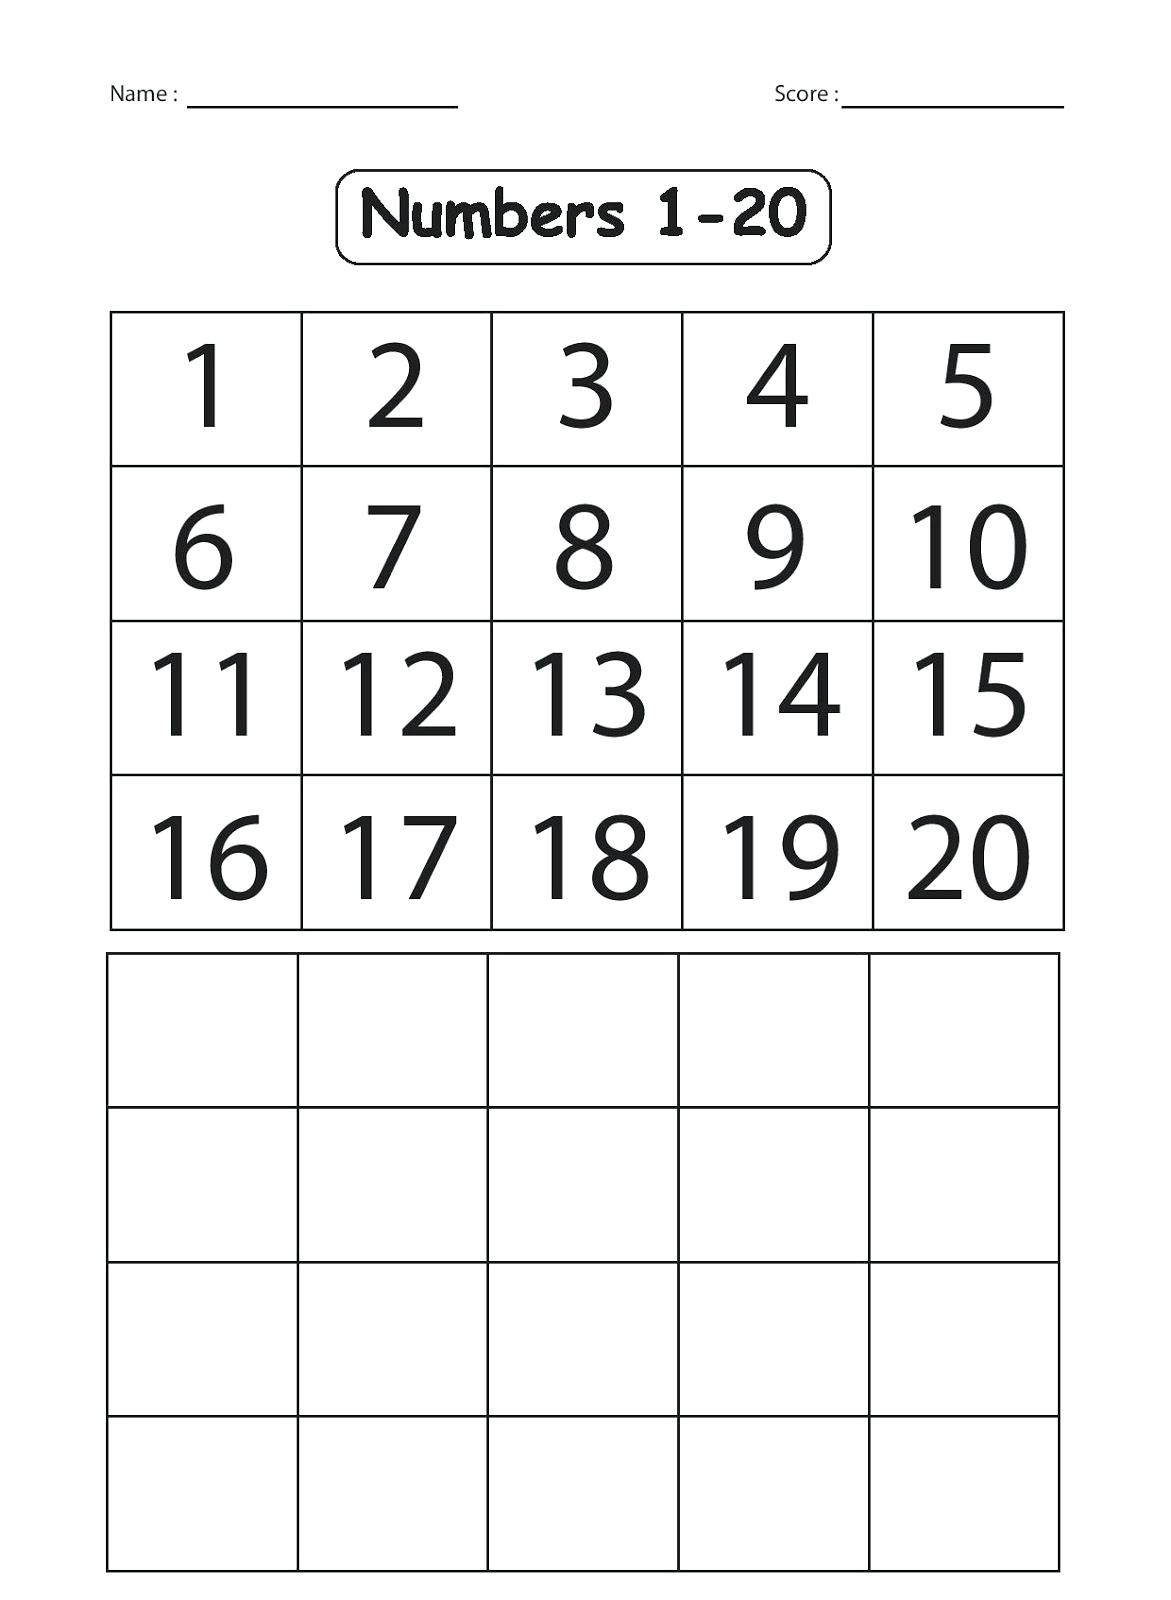 Kindergarten Number Worksheets 1 20 Worksheets Numbers 1 For - Free | Free Printable Counting Worksheets 1 20